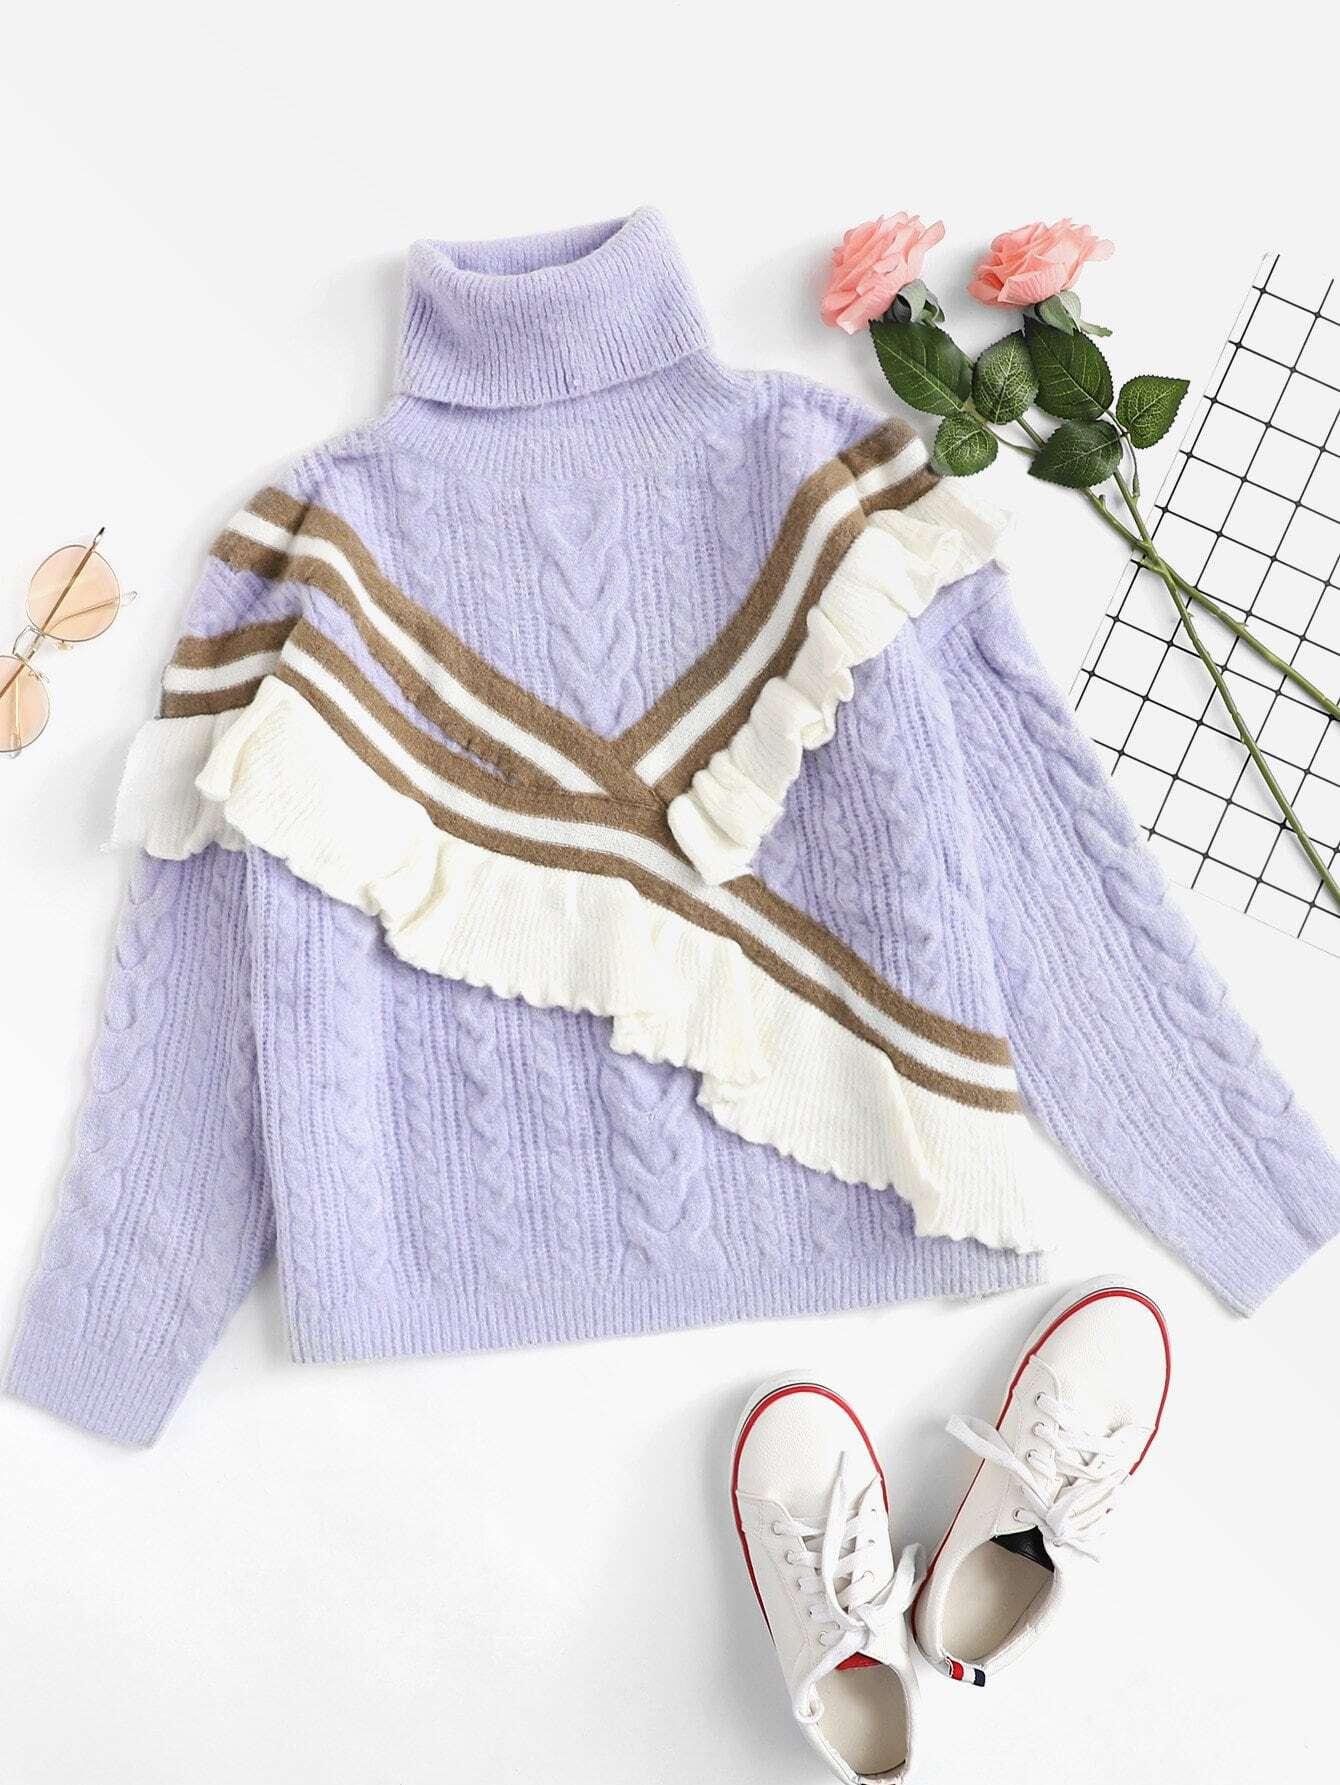 Купить Ruffle Embellished Mixed Knit Jumper, null, SheIn